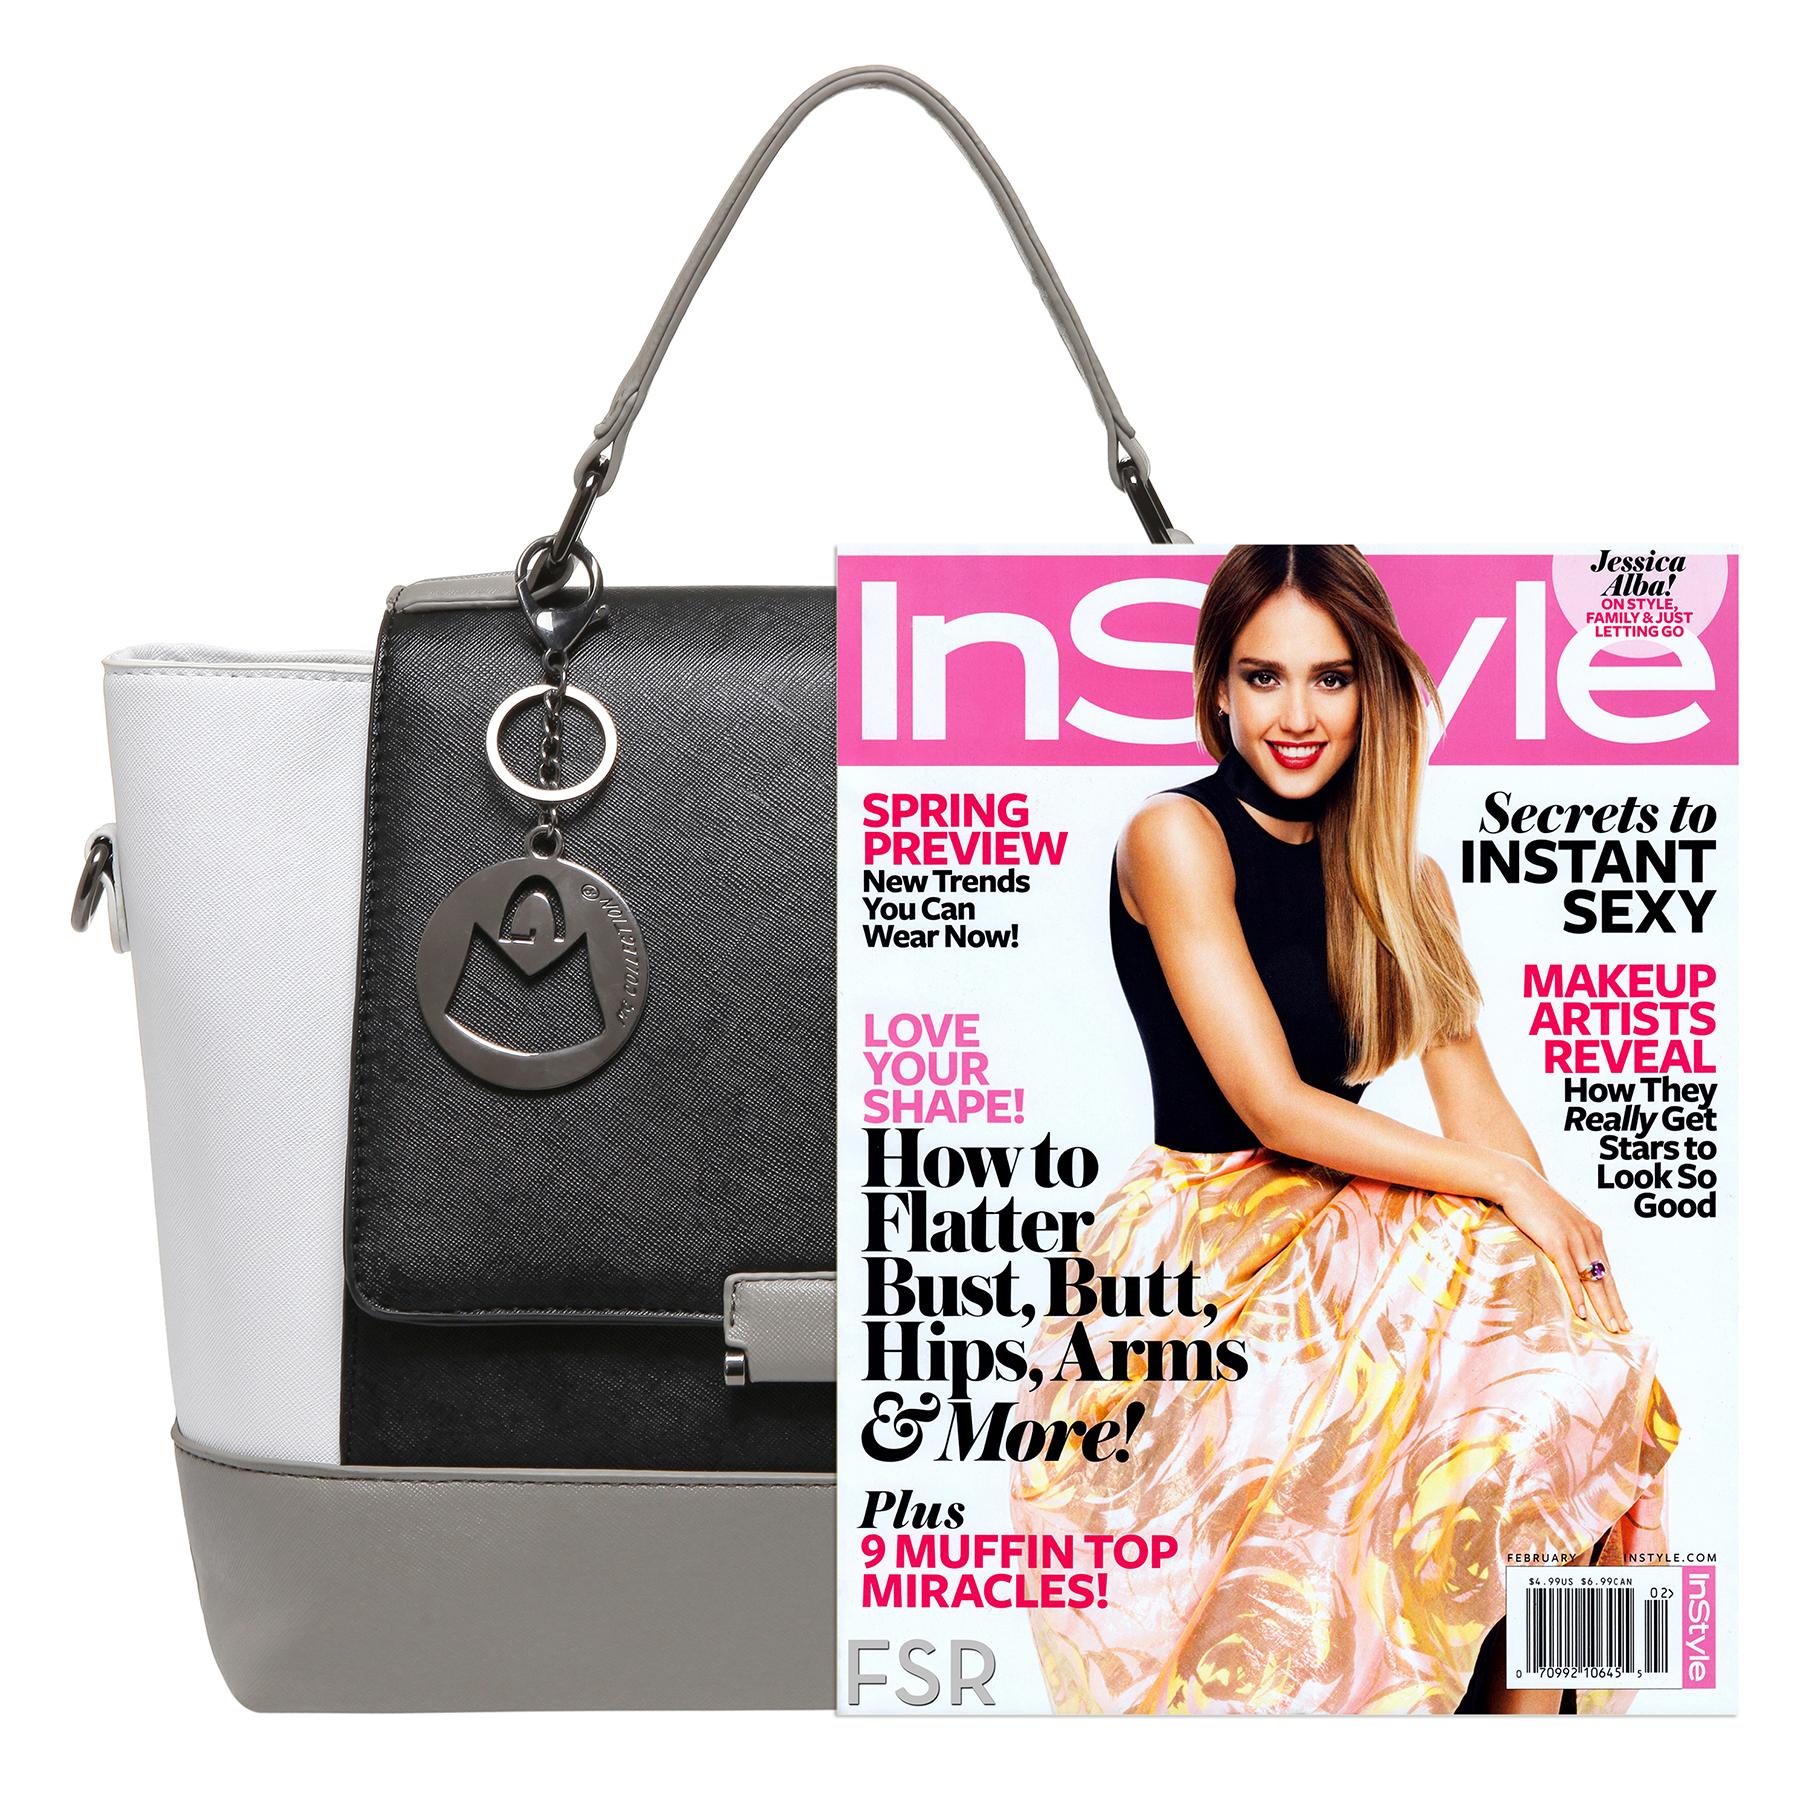 mg-collection-meryl-top-handle-tote-handbag-tb-h0651blk-7.jpg